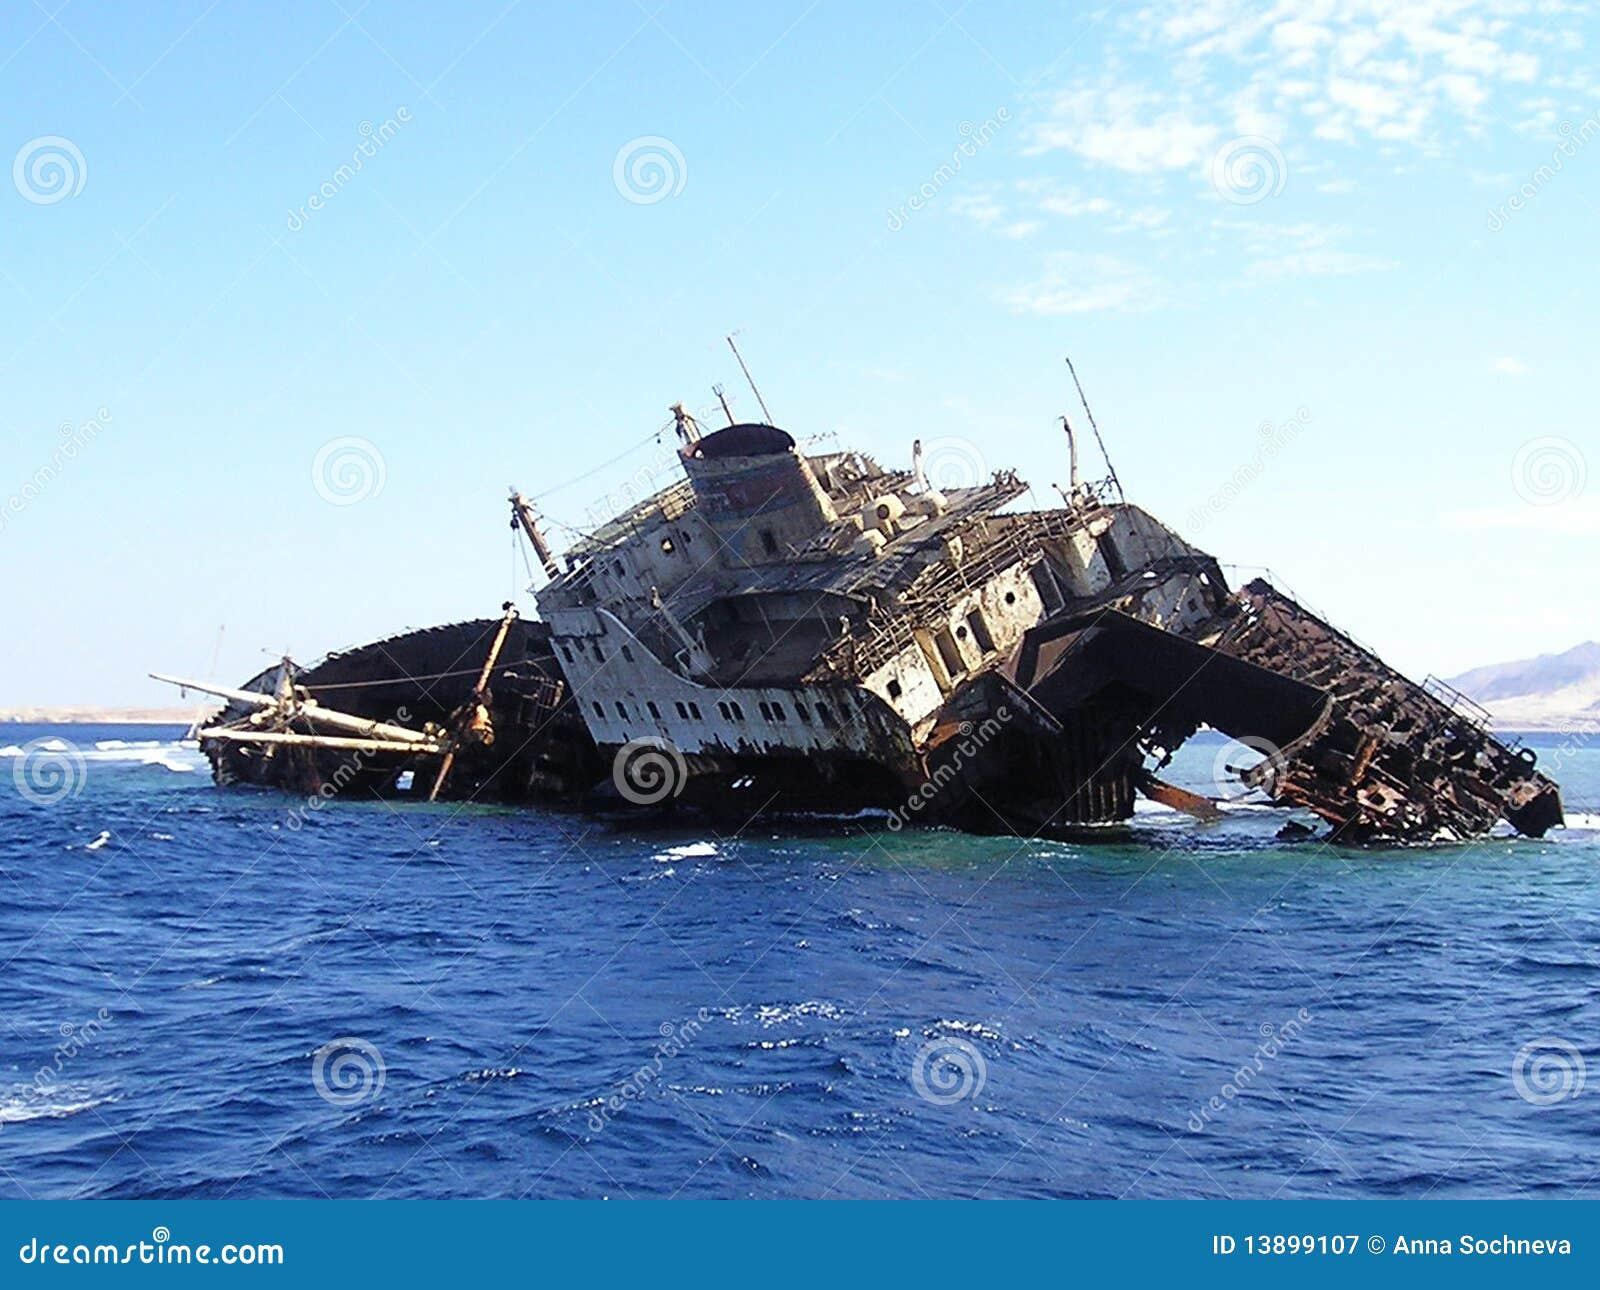 sunken ship royalty free stock photography image 13899107